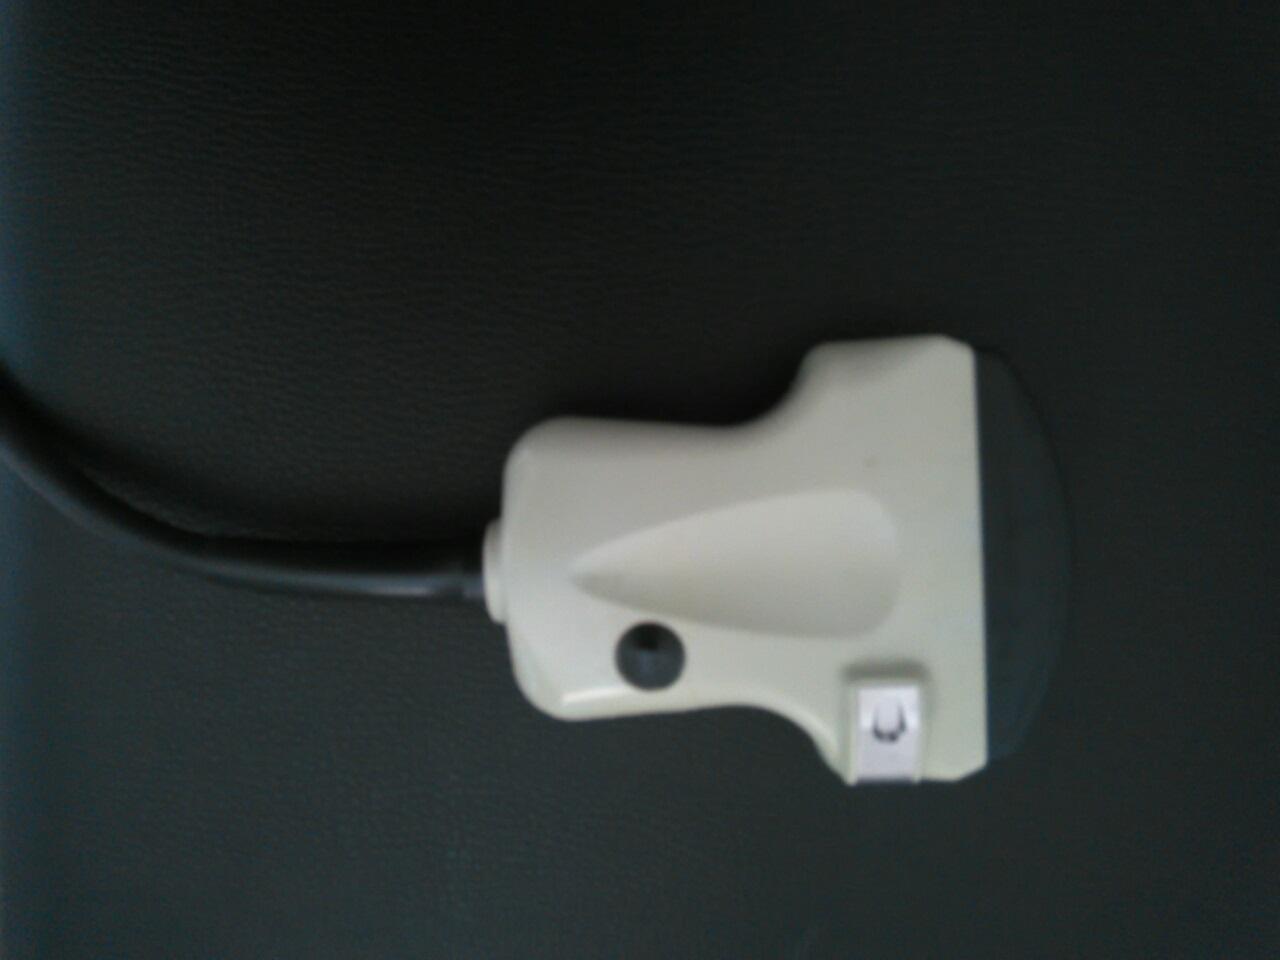 b k ultrasound machine